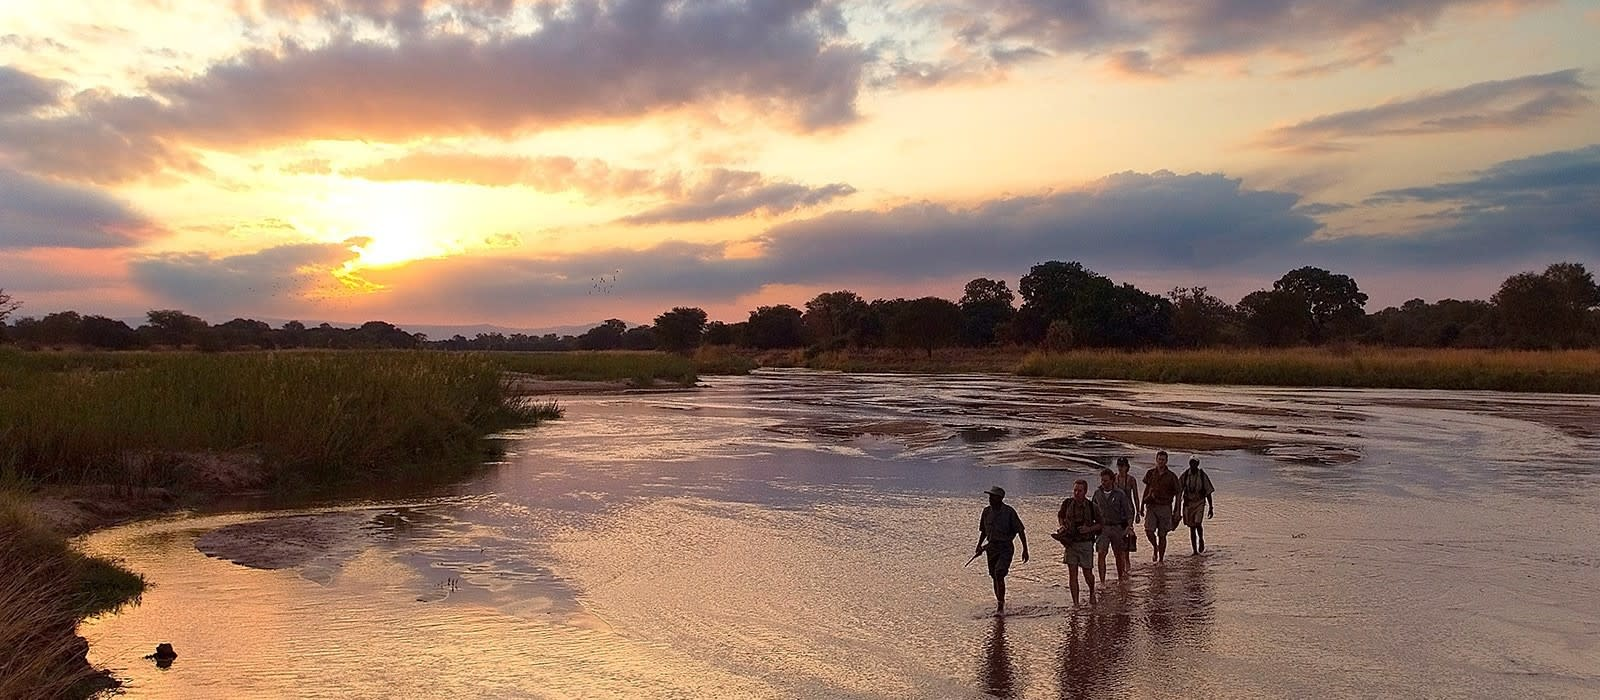 Reiseziel Majete Wildschutzgebiet Malawi